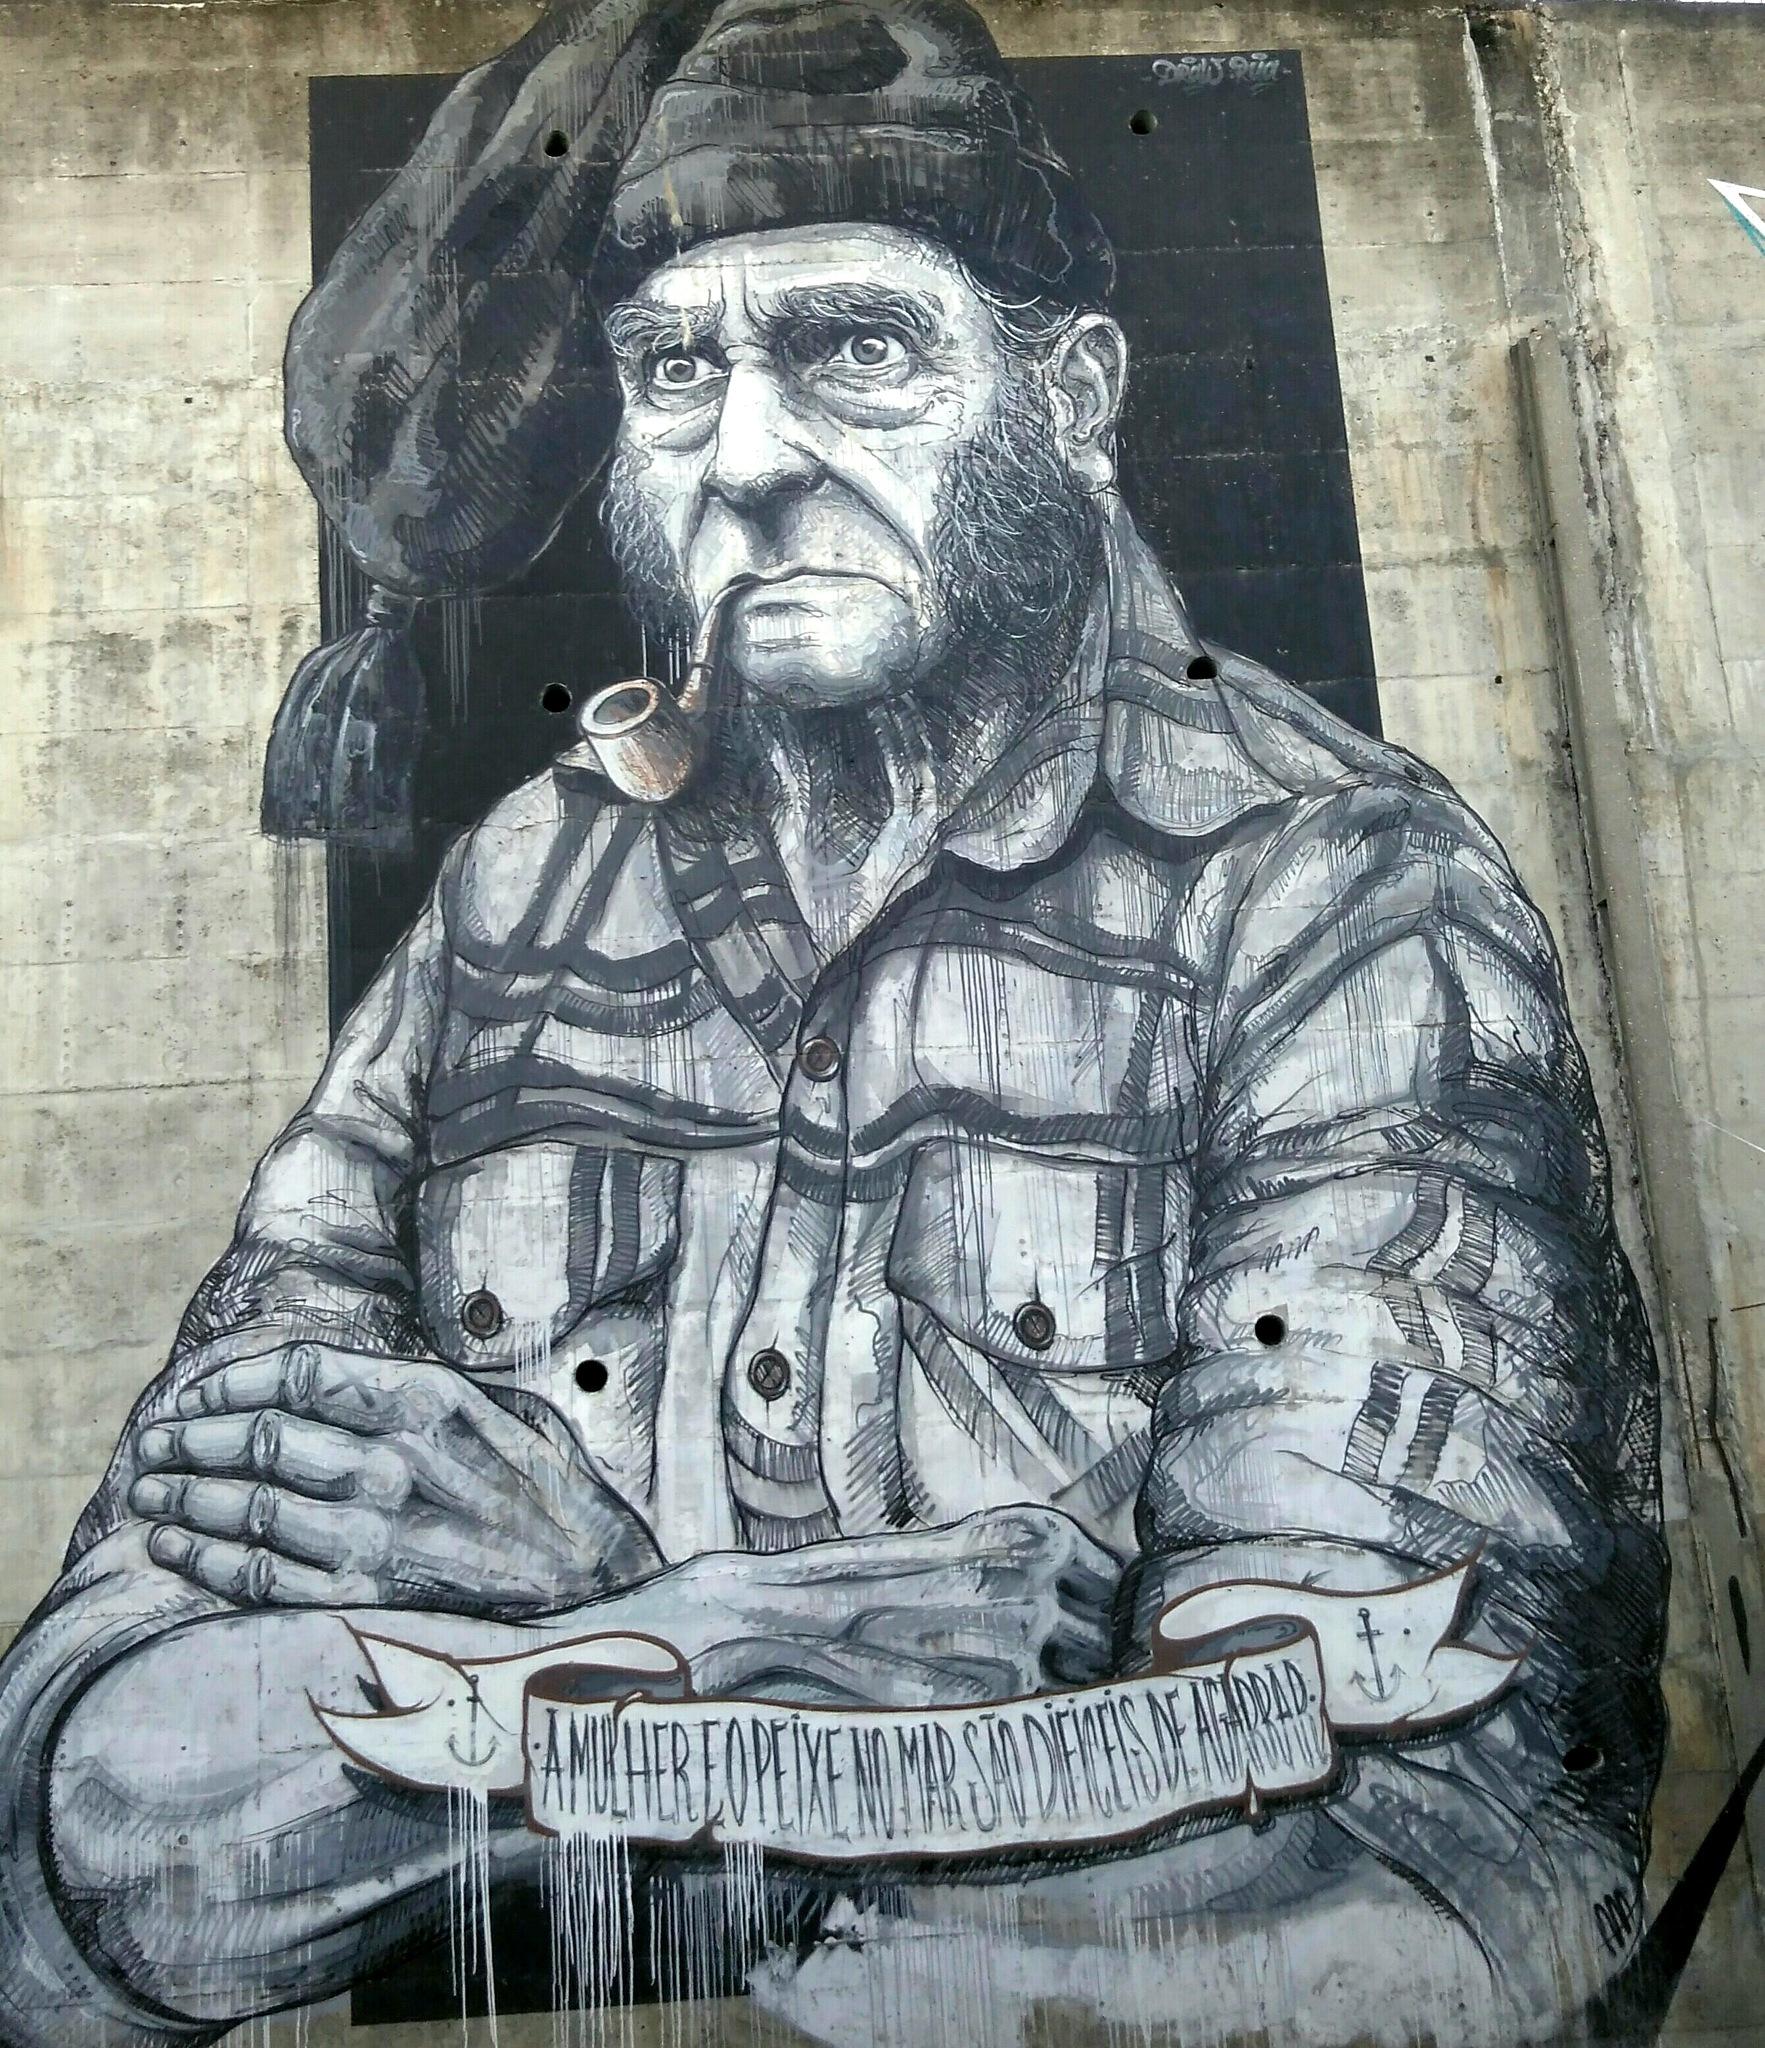 Graffiti Street Art by Filipe Oliver